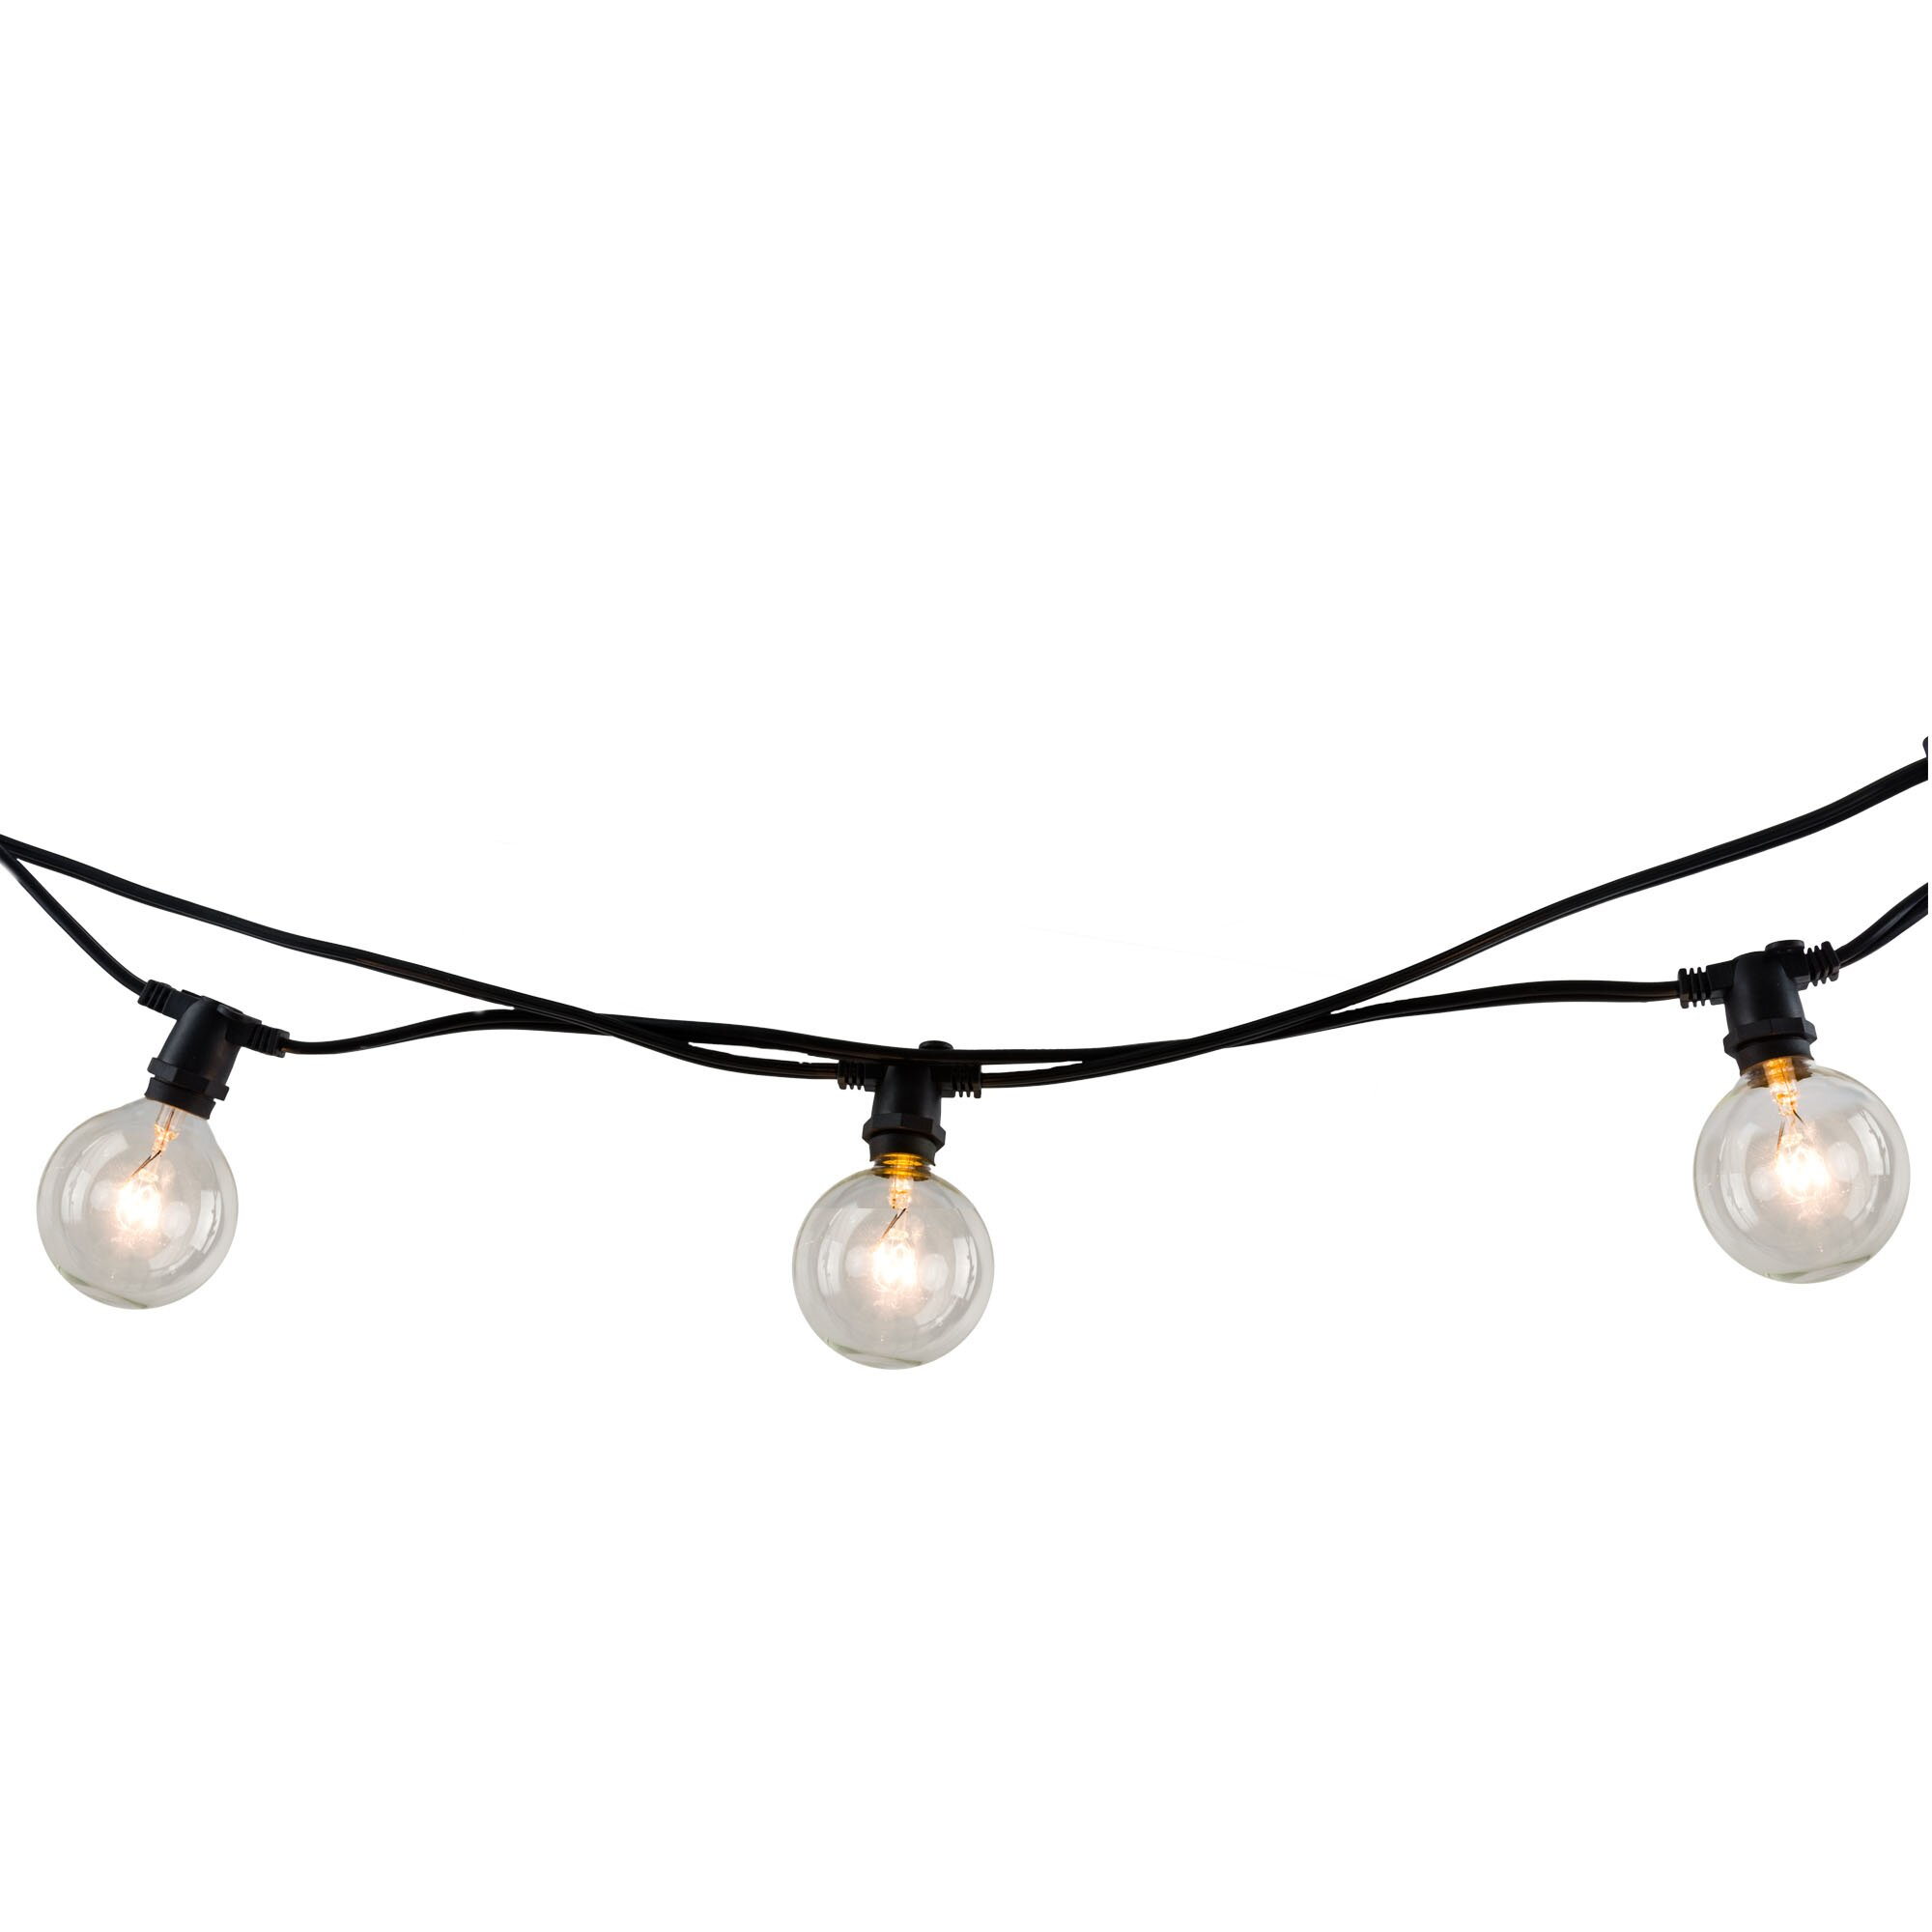 Bulbrite Industries 10-Light 14 ft. Globe String Light & Reviews Wayfair Supply